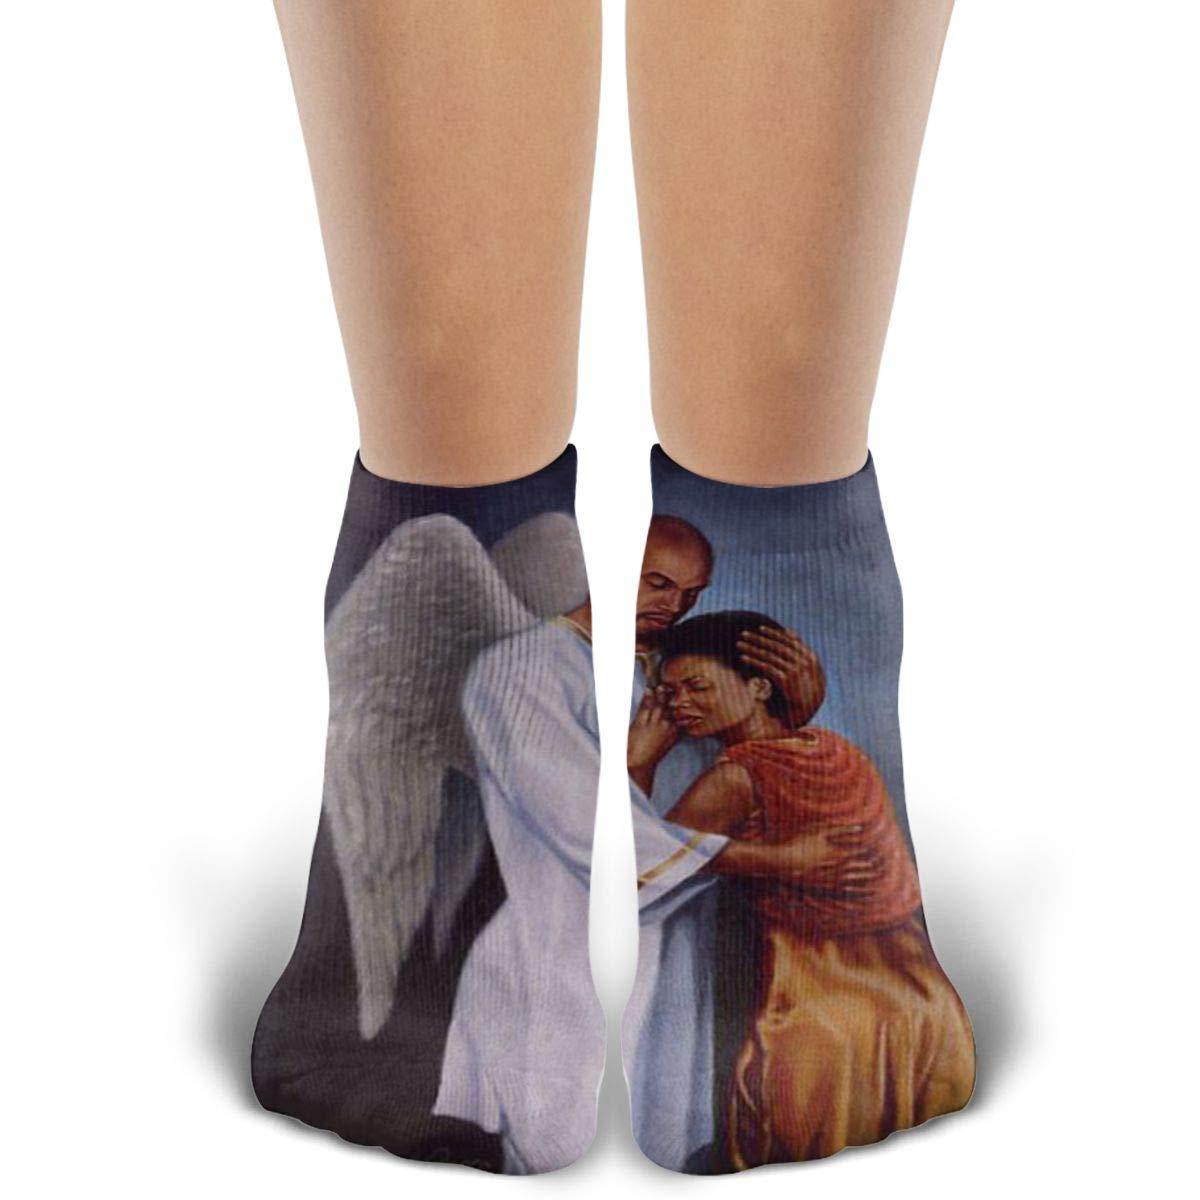 Unisex Comfort Black Art Performance Cushion Cotton Low Cut Ankle Athletic Socks For Men Women And Girls Boys